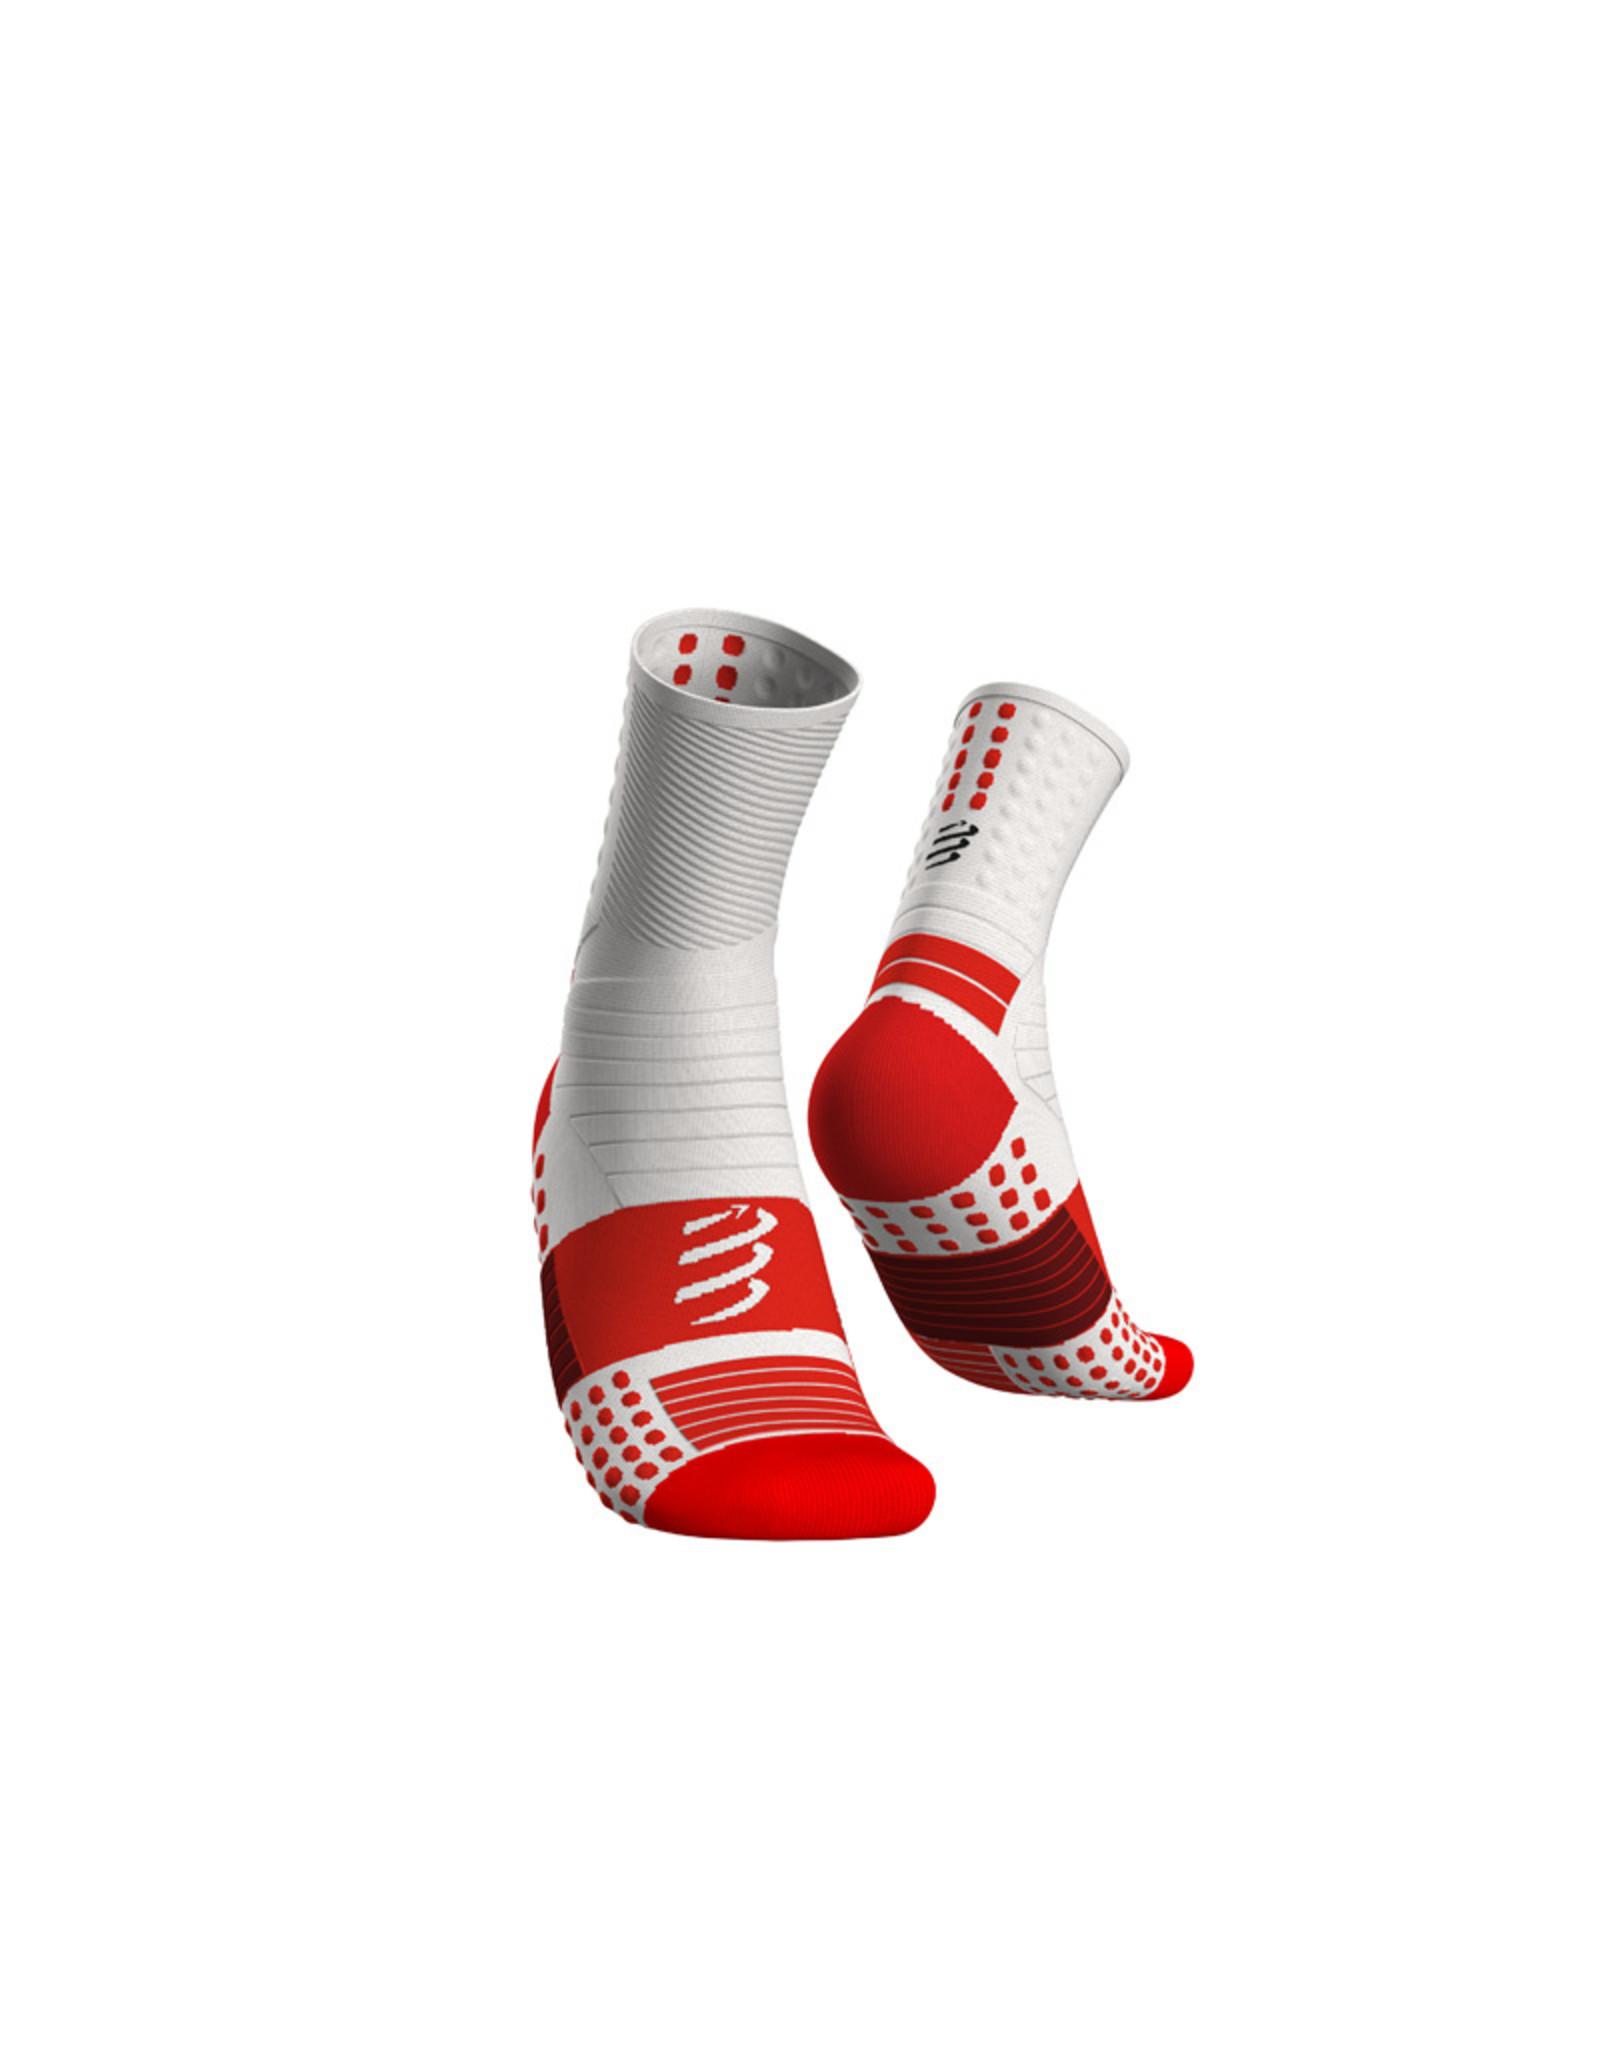 Compressport Pro Marathon Socks Hardloopsokken Hoog - Wit